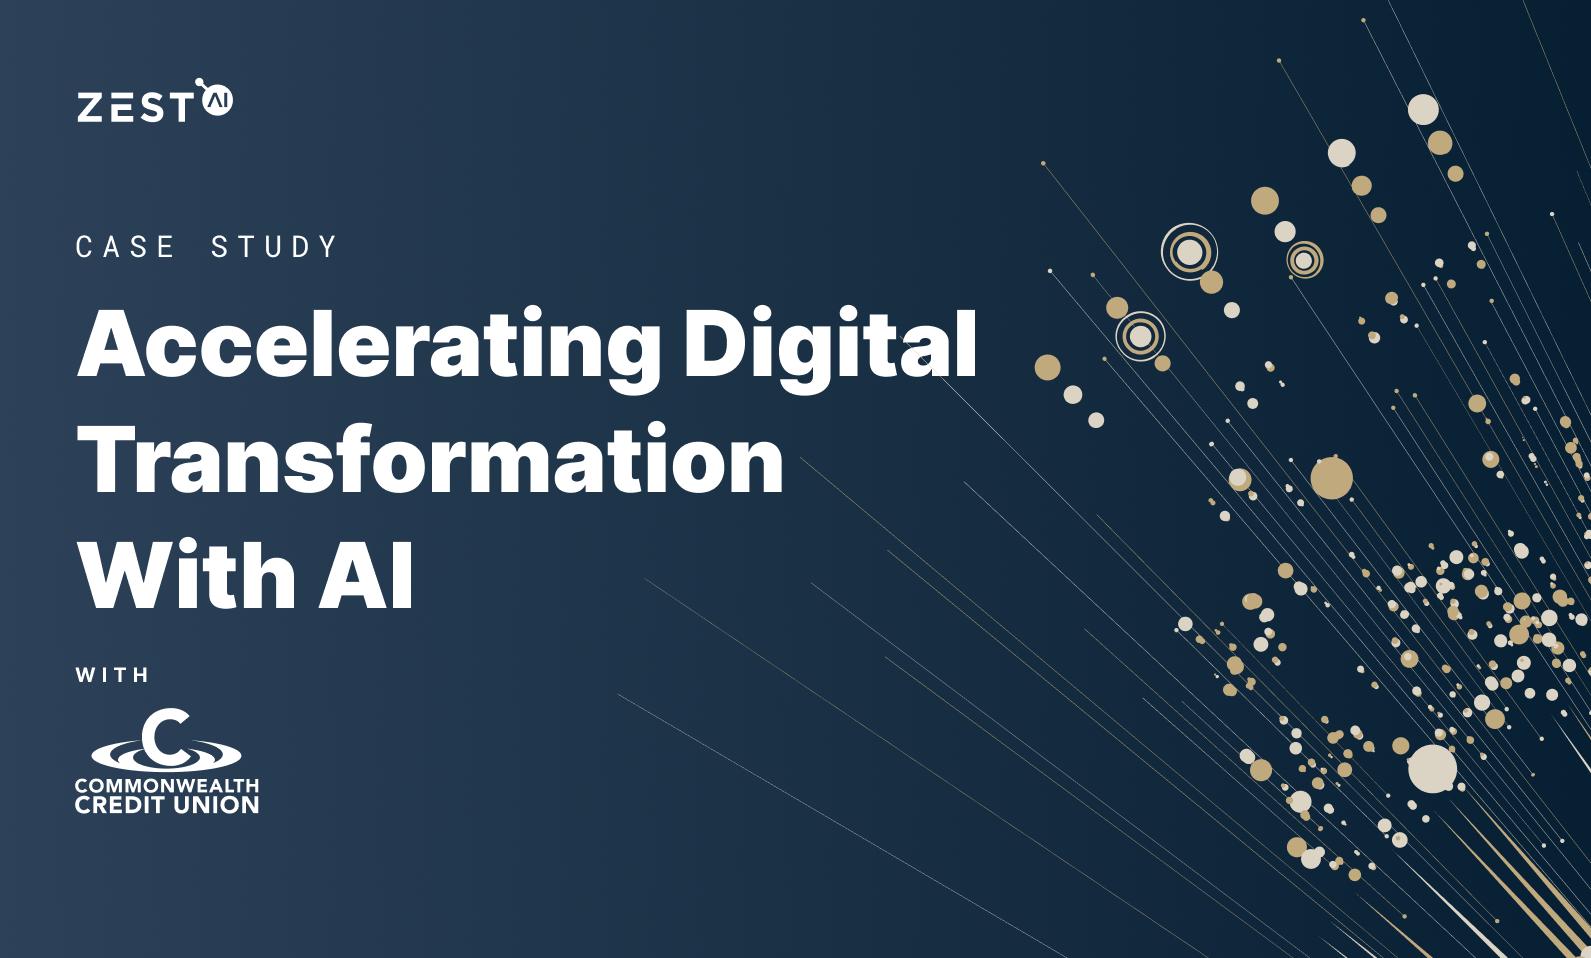 Accelerating Digital Transformation Case Study